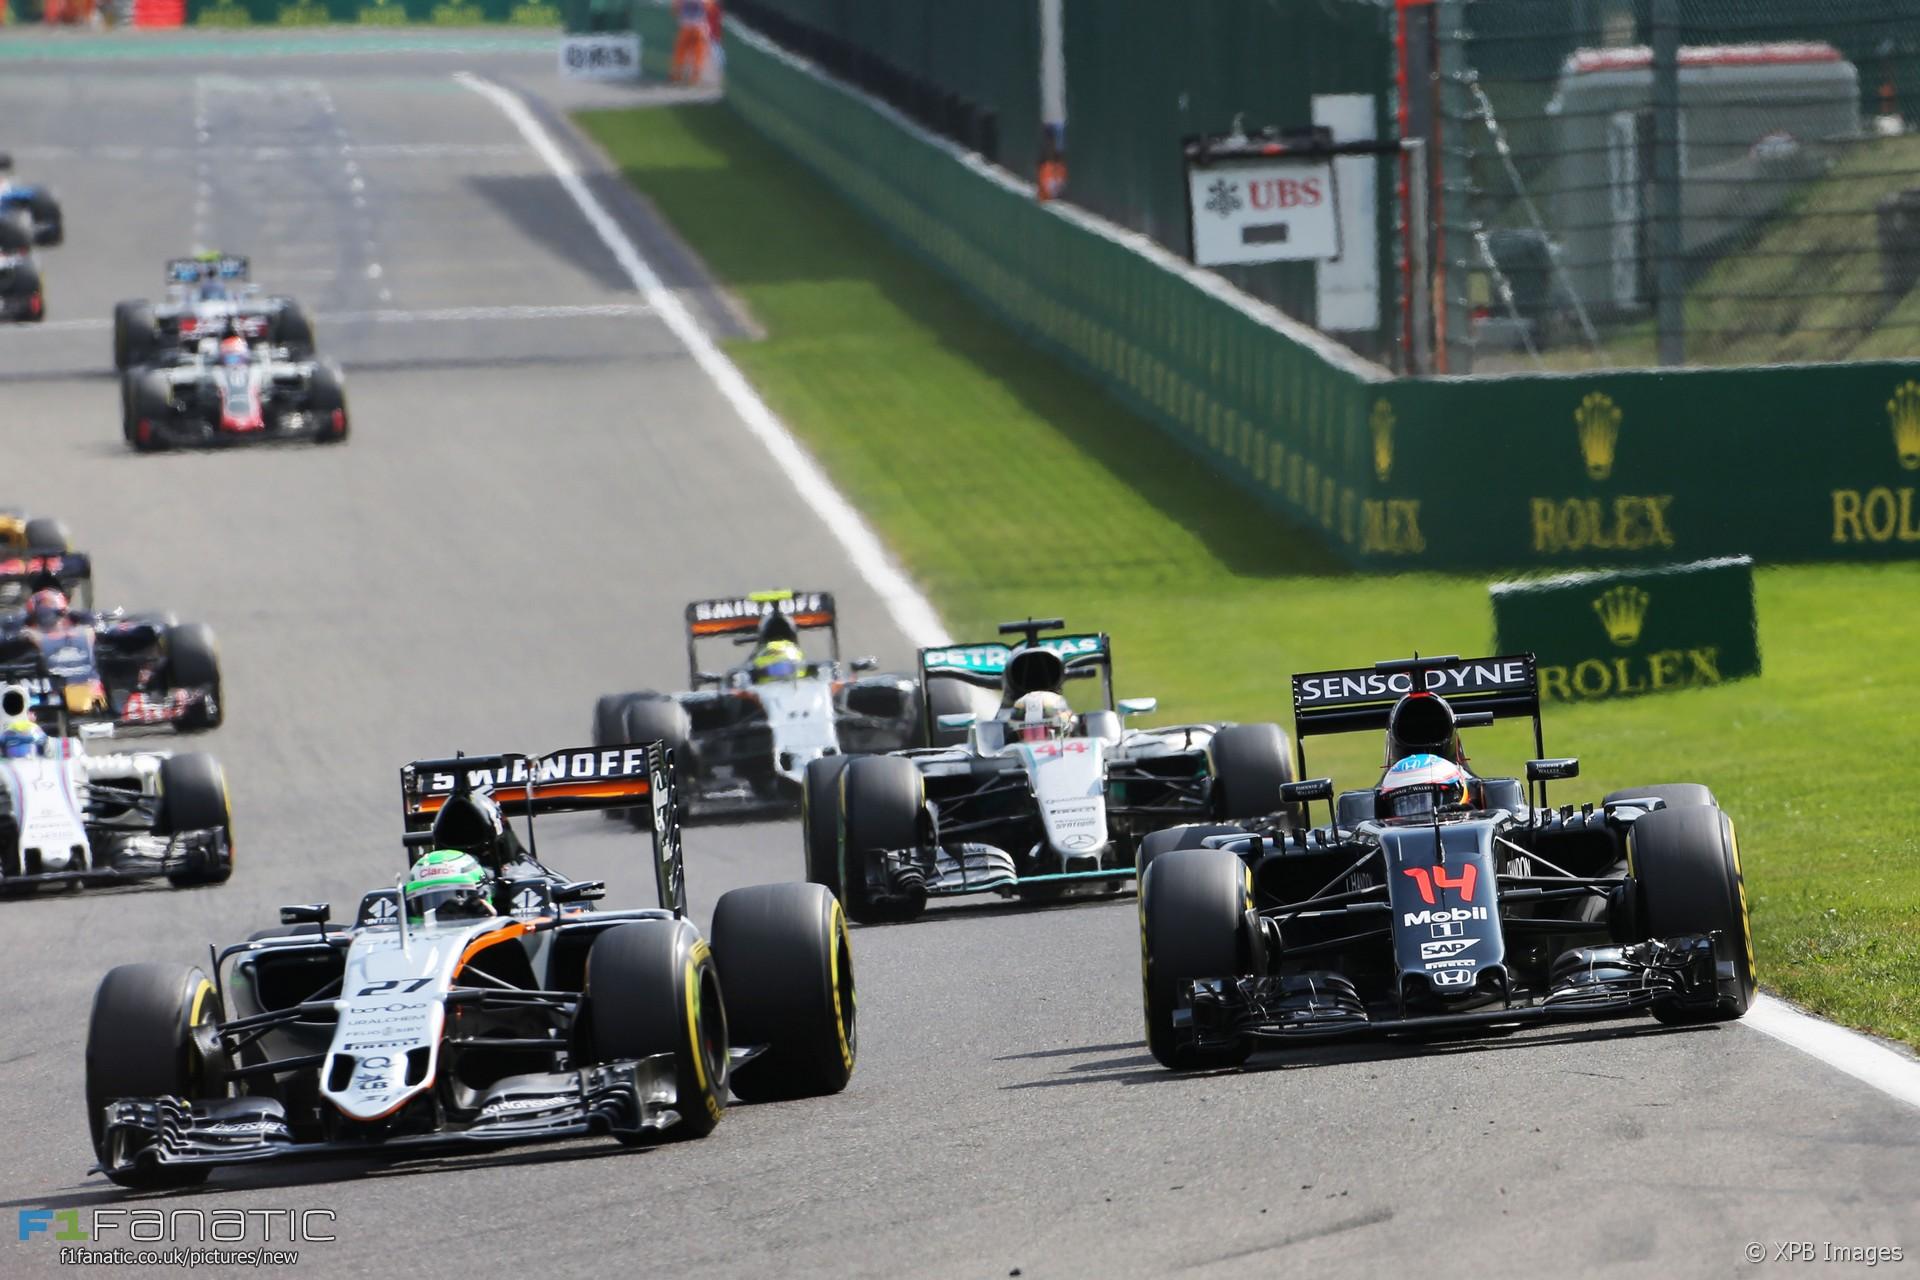 Nico Hulkenberg, Force India, Spa-Francorchamps, 2016